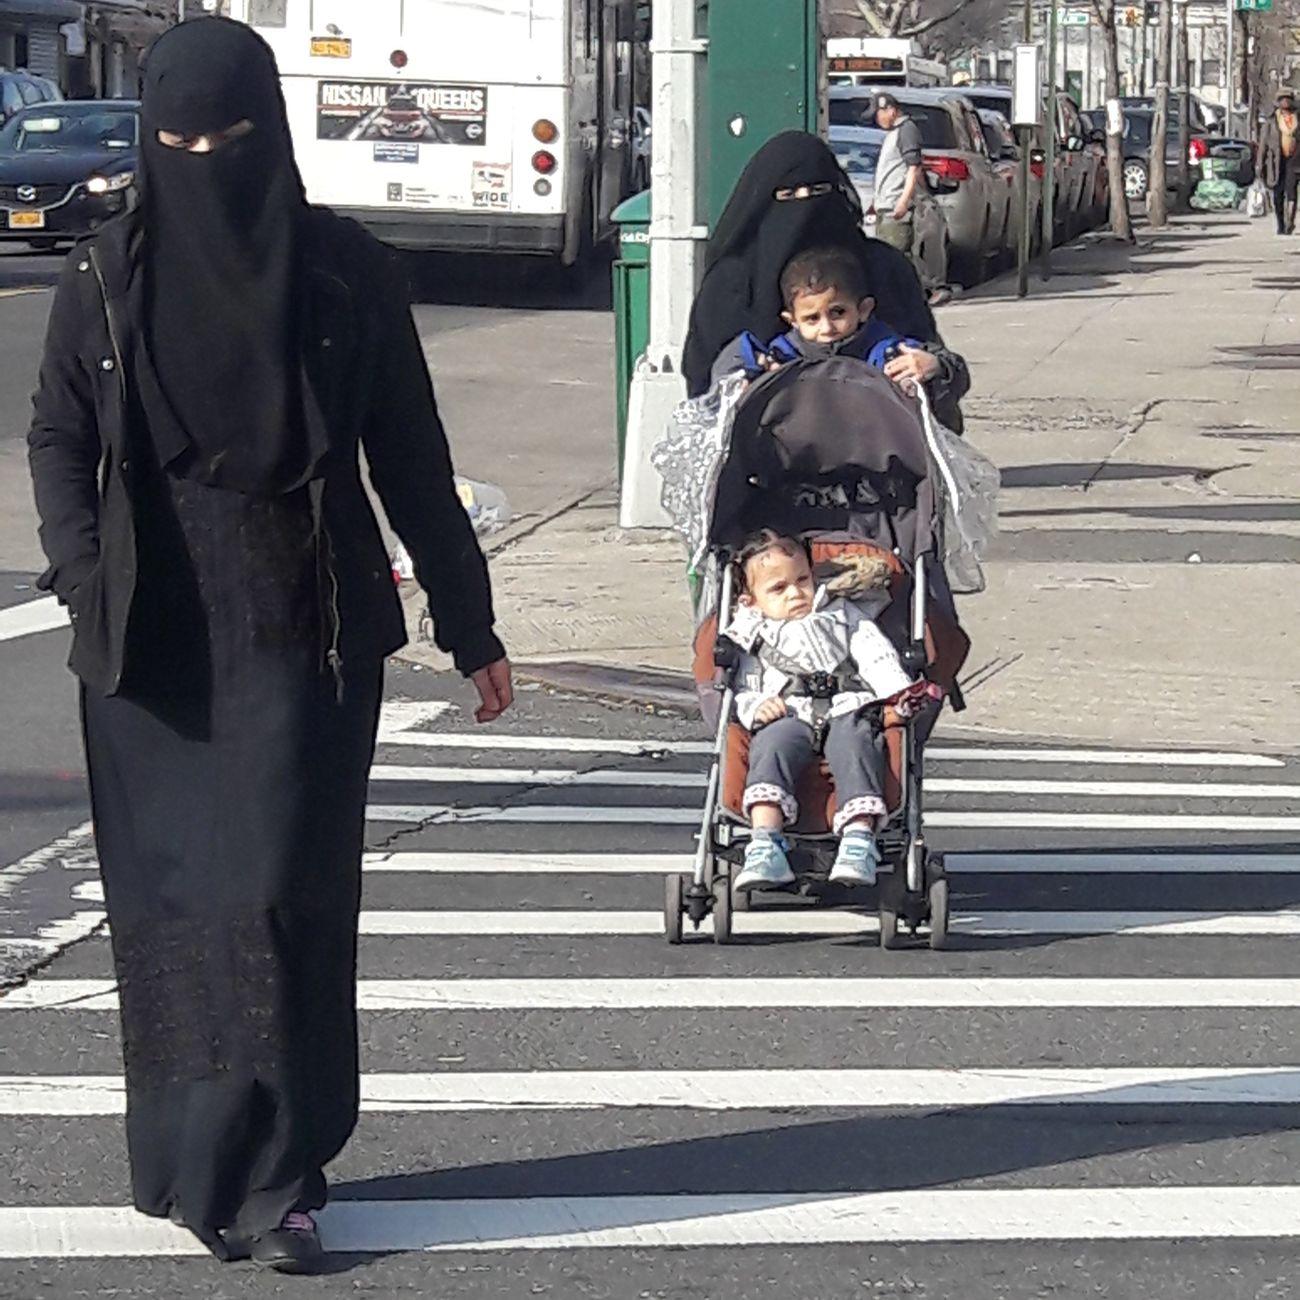 Muslim Woman Muslim Culture Muslimahfashion Lifestyles Wayoflife Queens NYC Muslim Children Freedom Of Expression The American Dream Street Photography Eyem Photography Newyorkcityphotographer EyemPhotographer